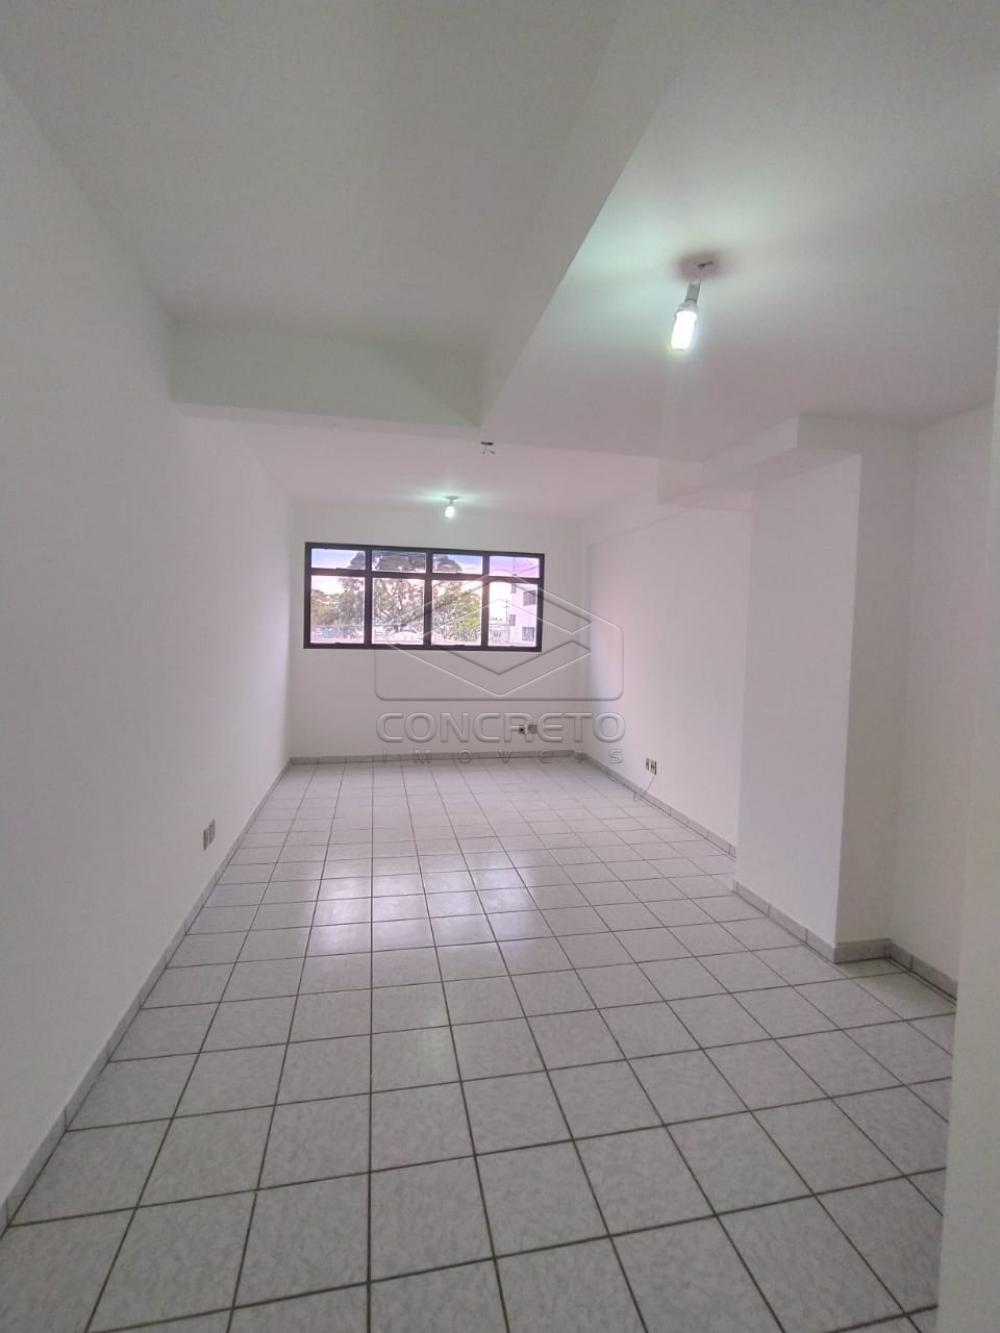 Alugar Comercial / Sala em Bauru R$ 700,00 - Foto 3